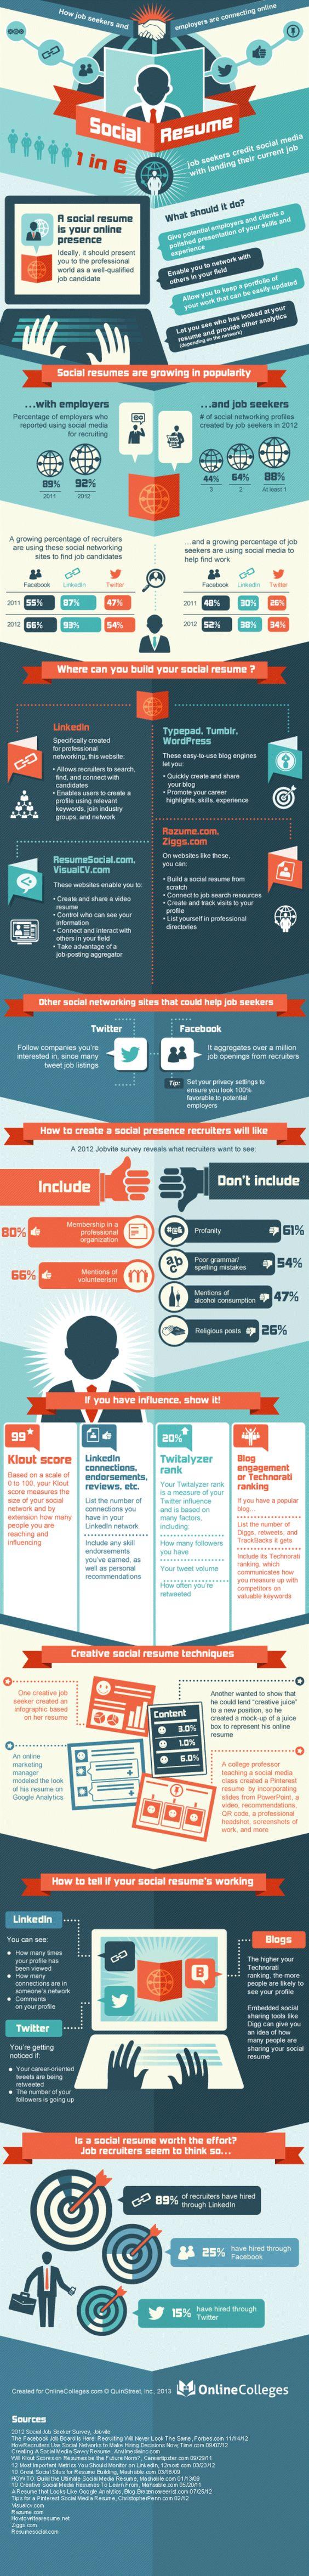 Online Resume / CV Tips and Tricks [Infographic]   #socialmedia